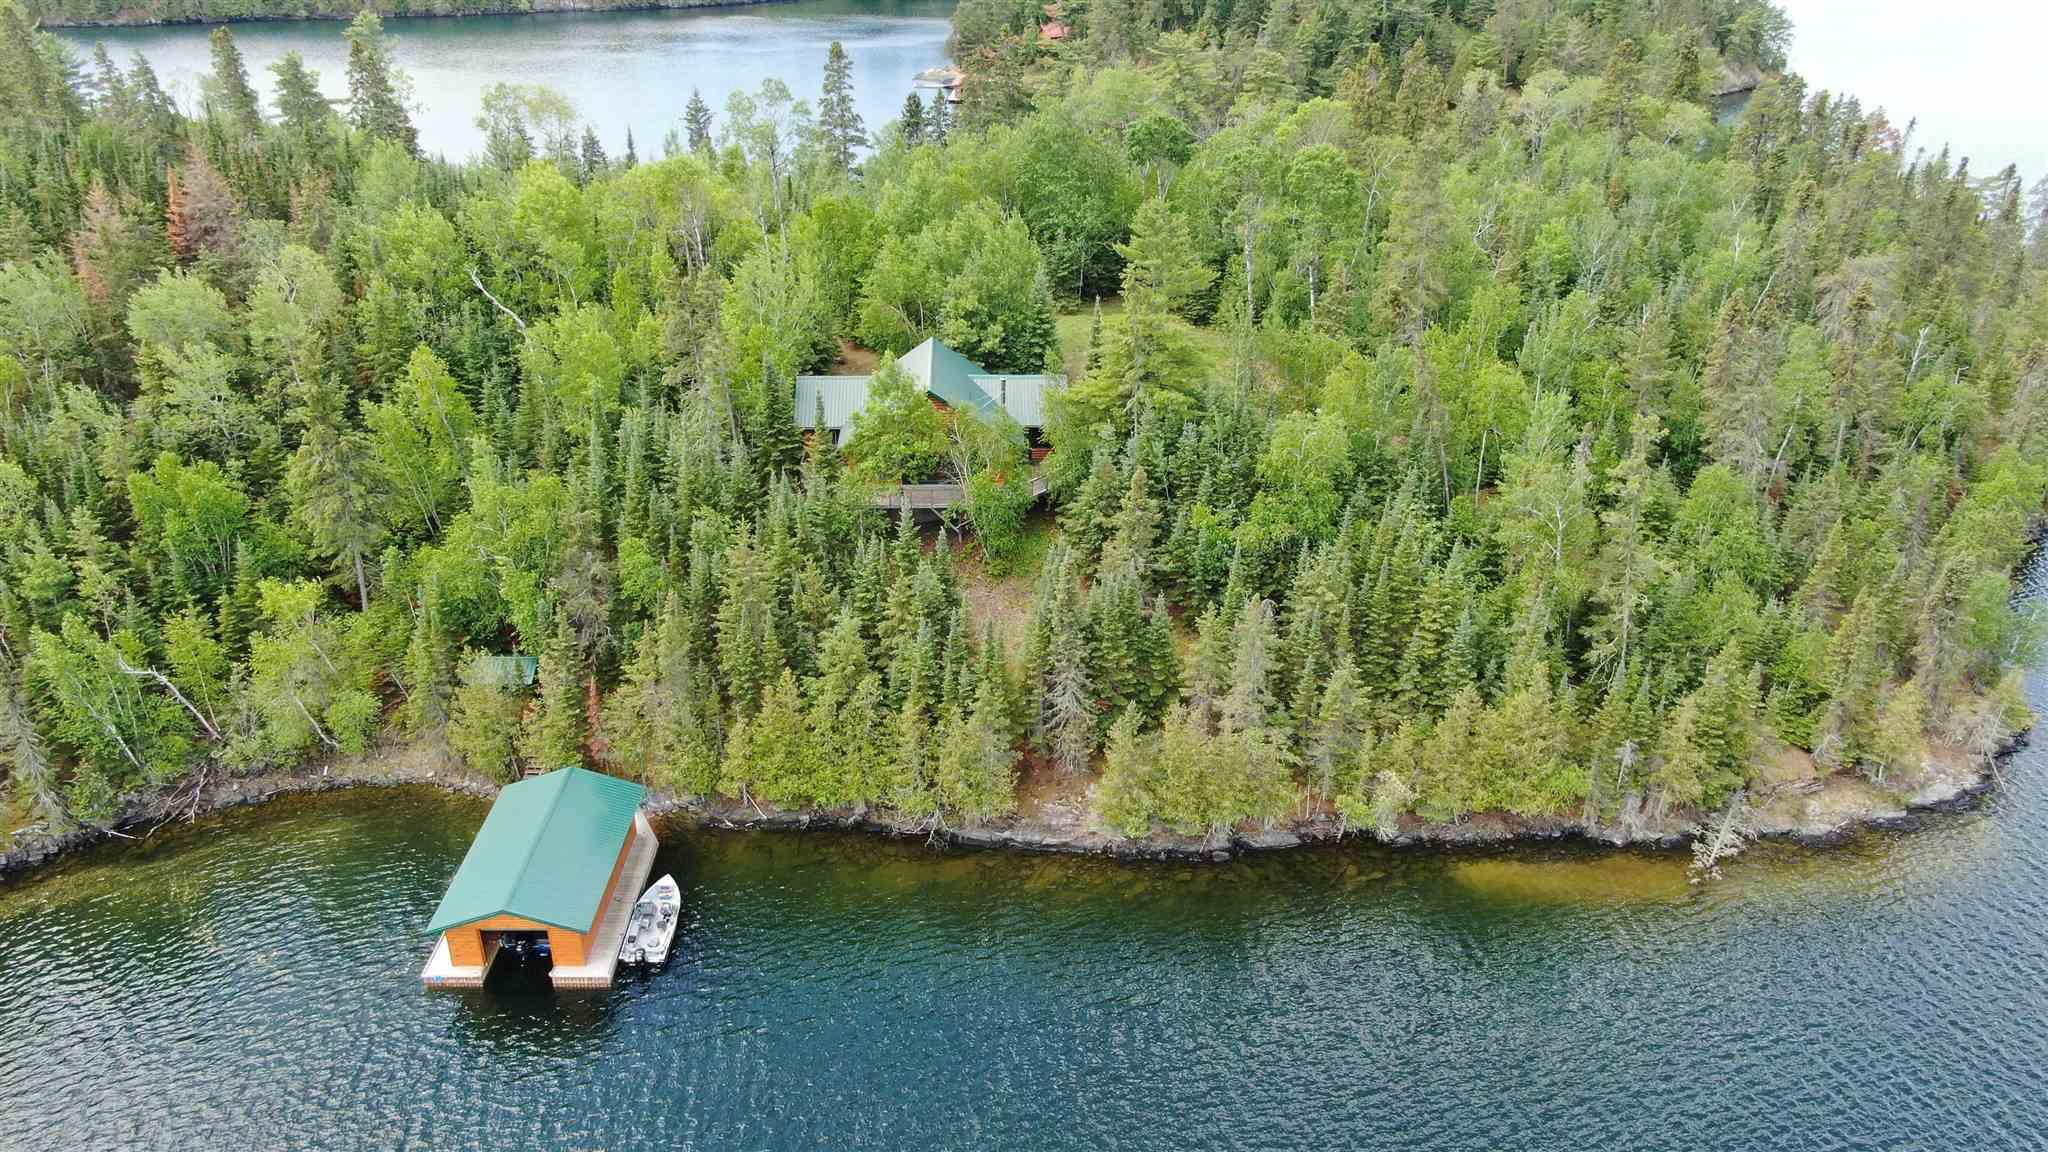 3 Whitefish Bay Island 6, Sioux Narrows Ontario, Canada